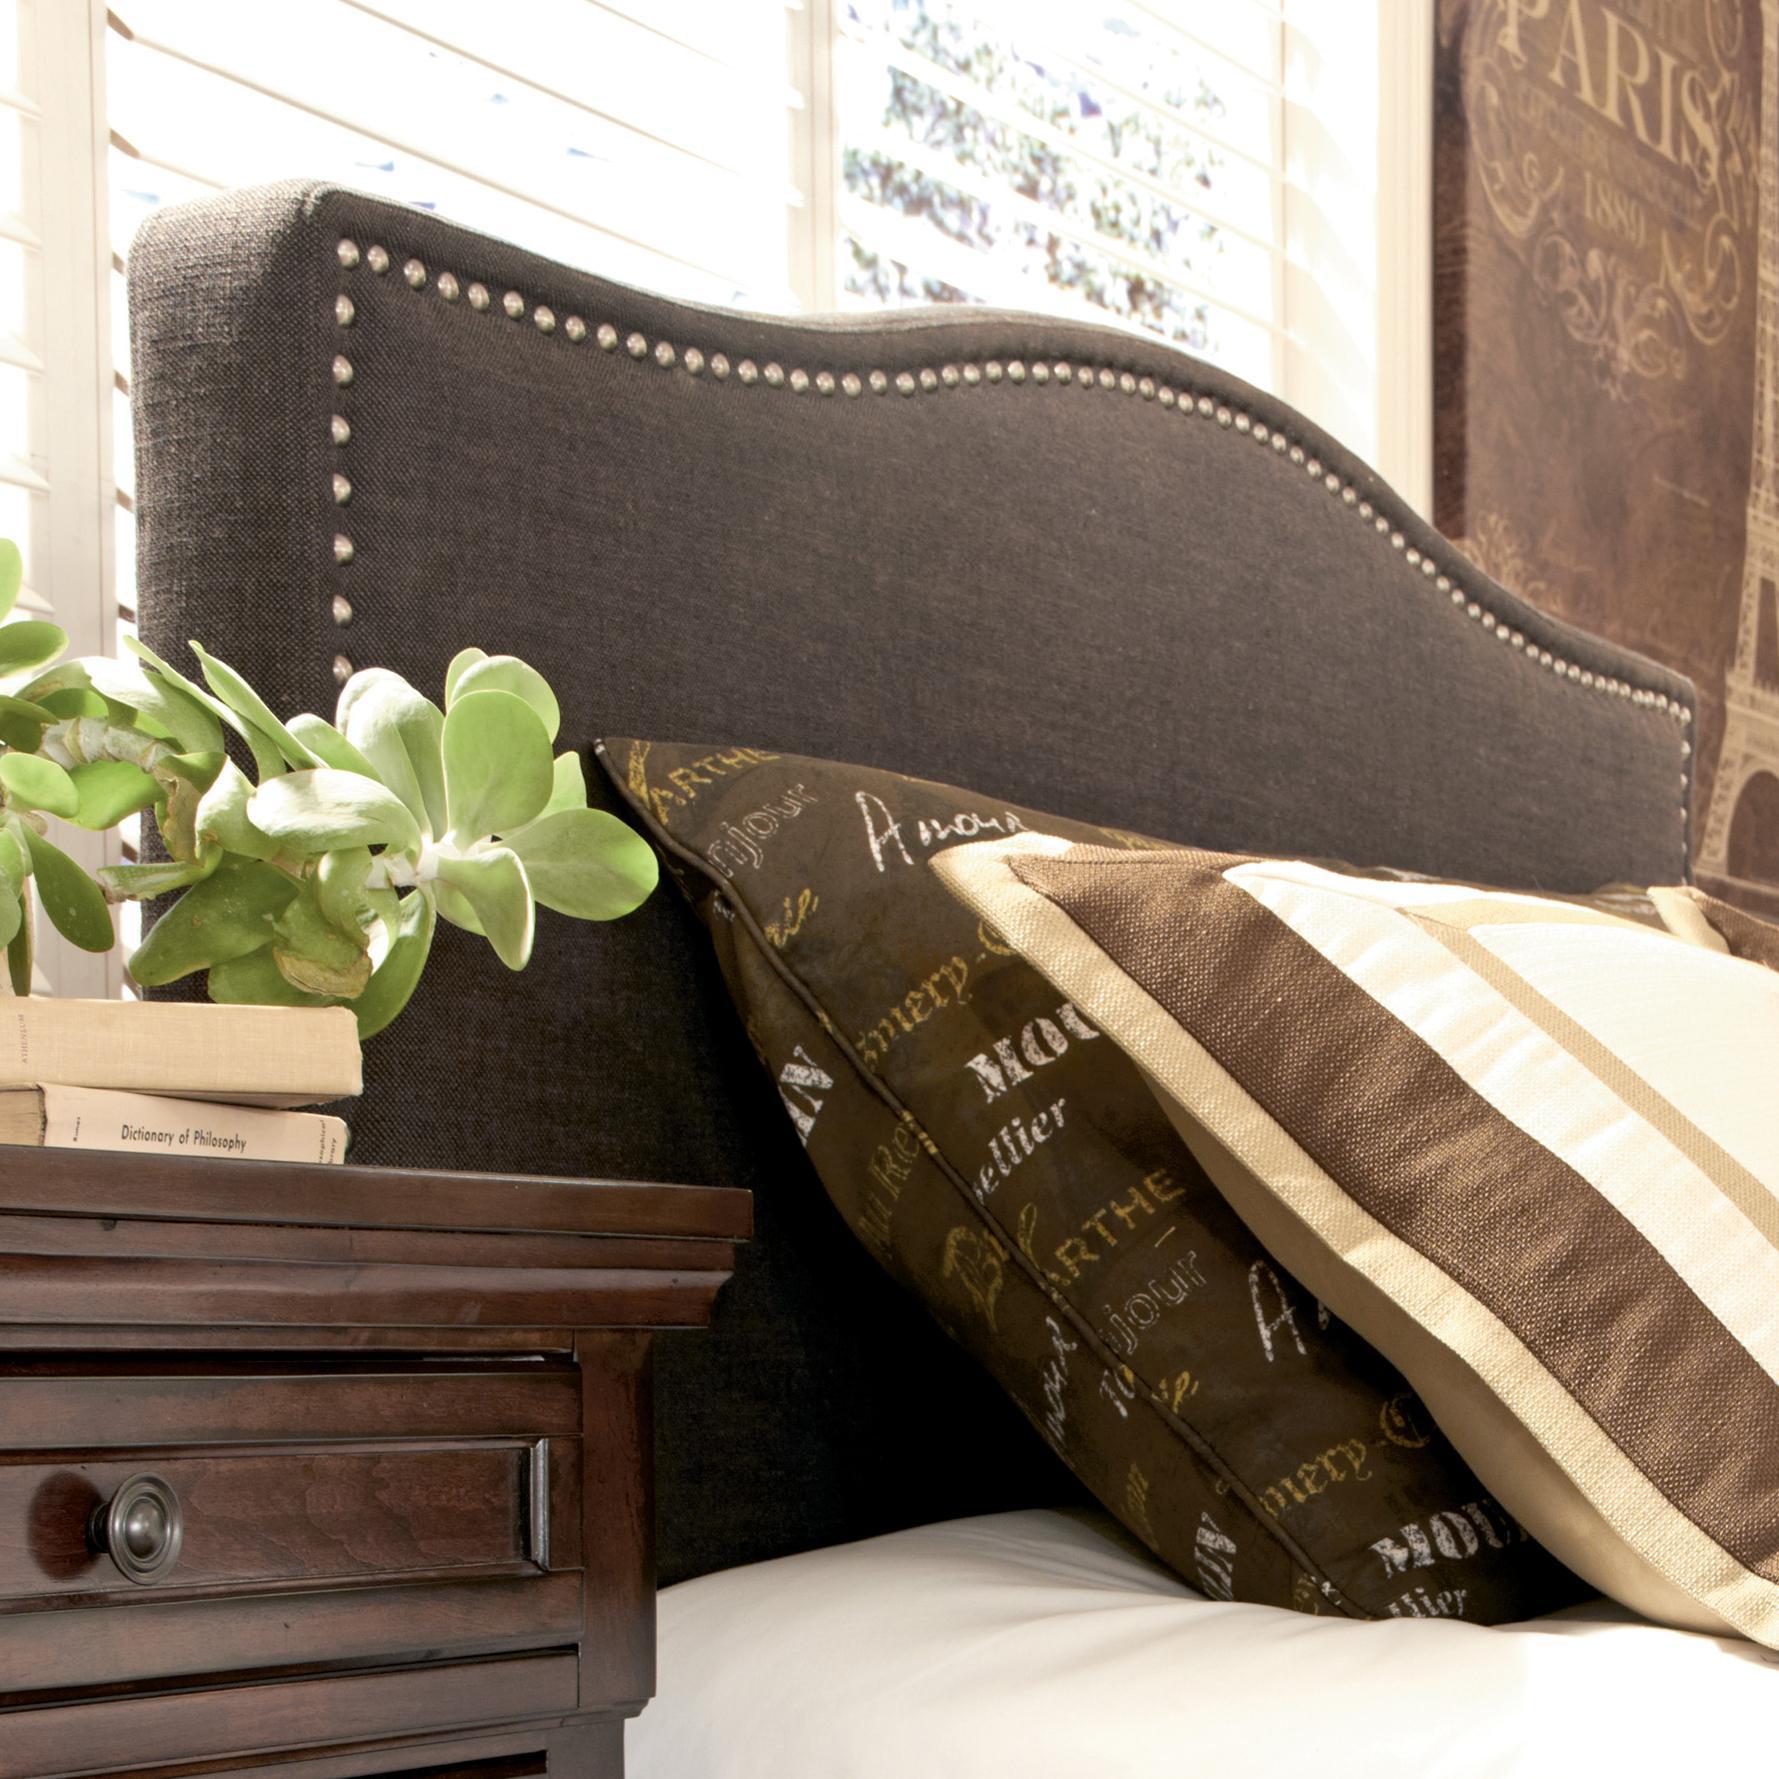 kingcalifornia king upholstered headboard with brown woven fabric  - kingcalifornia king upholstered headboard with brown woven fabric